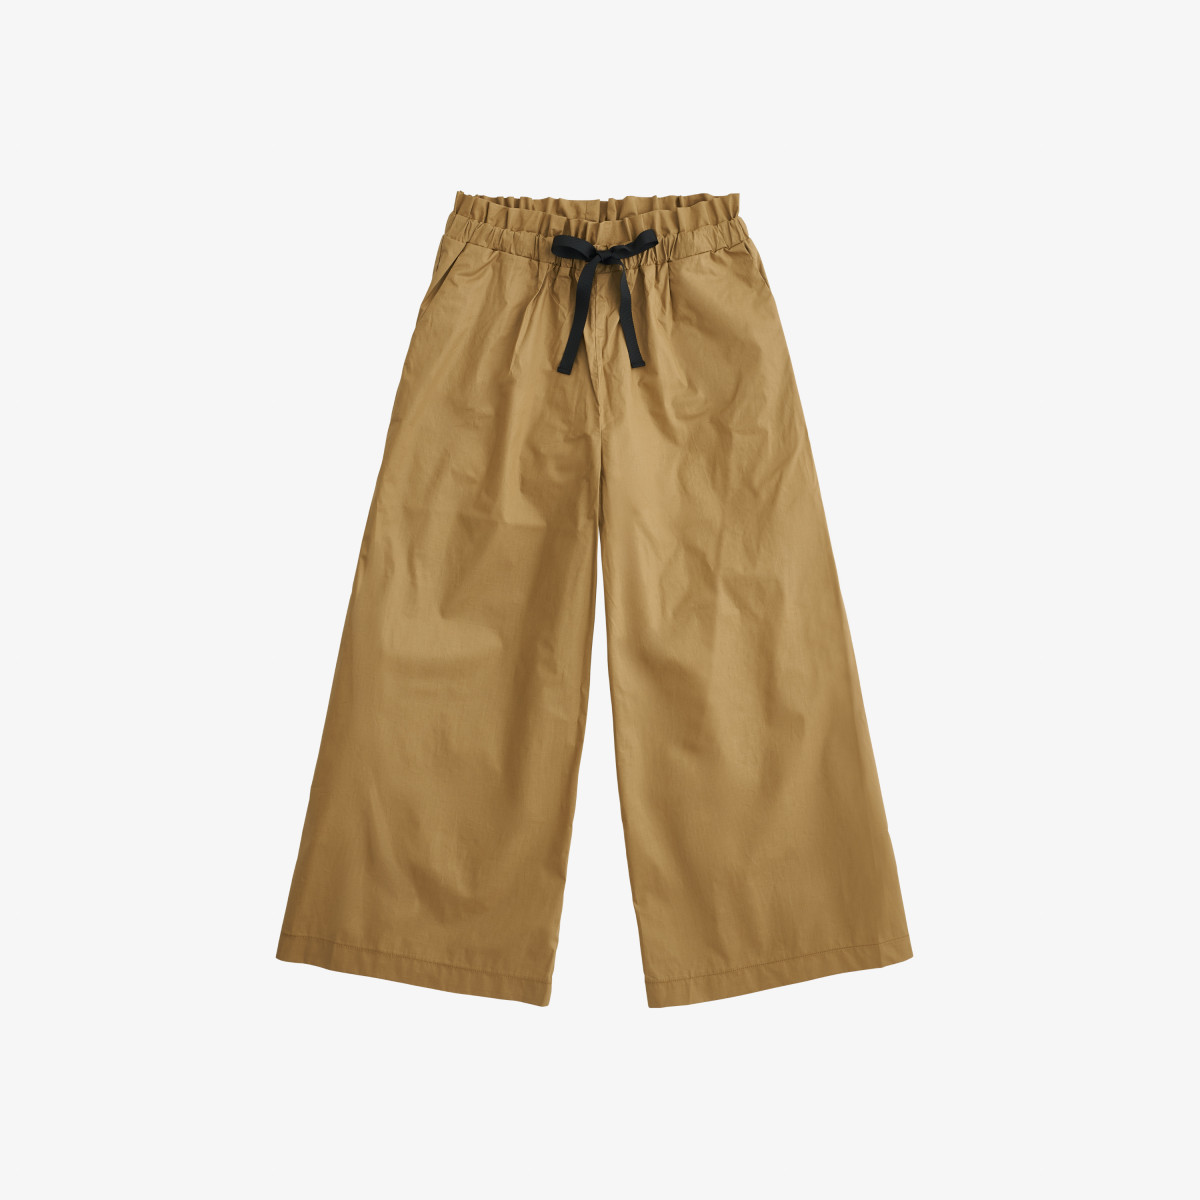 PANTS WIDE LEGS DESERT